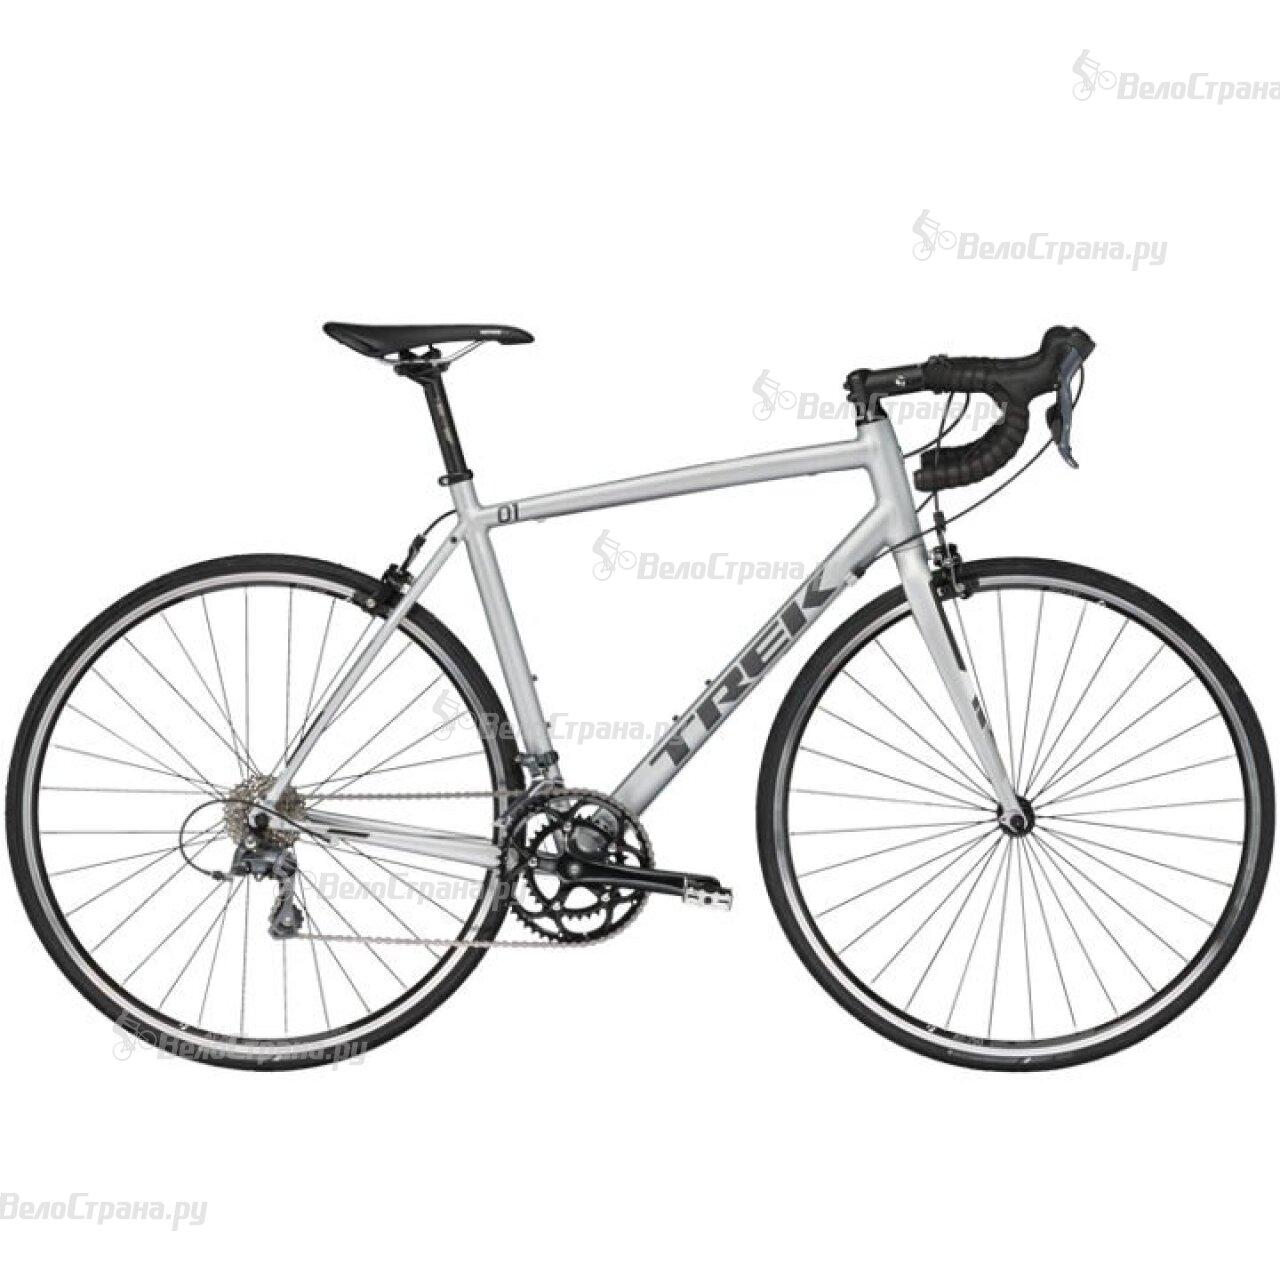 Велосипед Trek 1.1 C H2 (2017) велосипед trek 1 2 c h2 2013